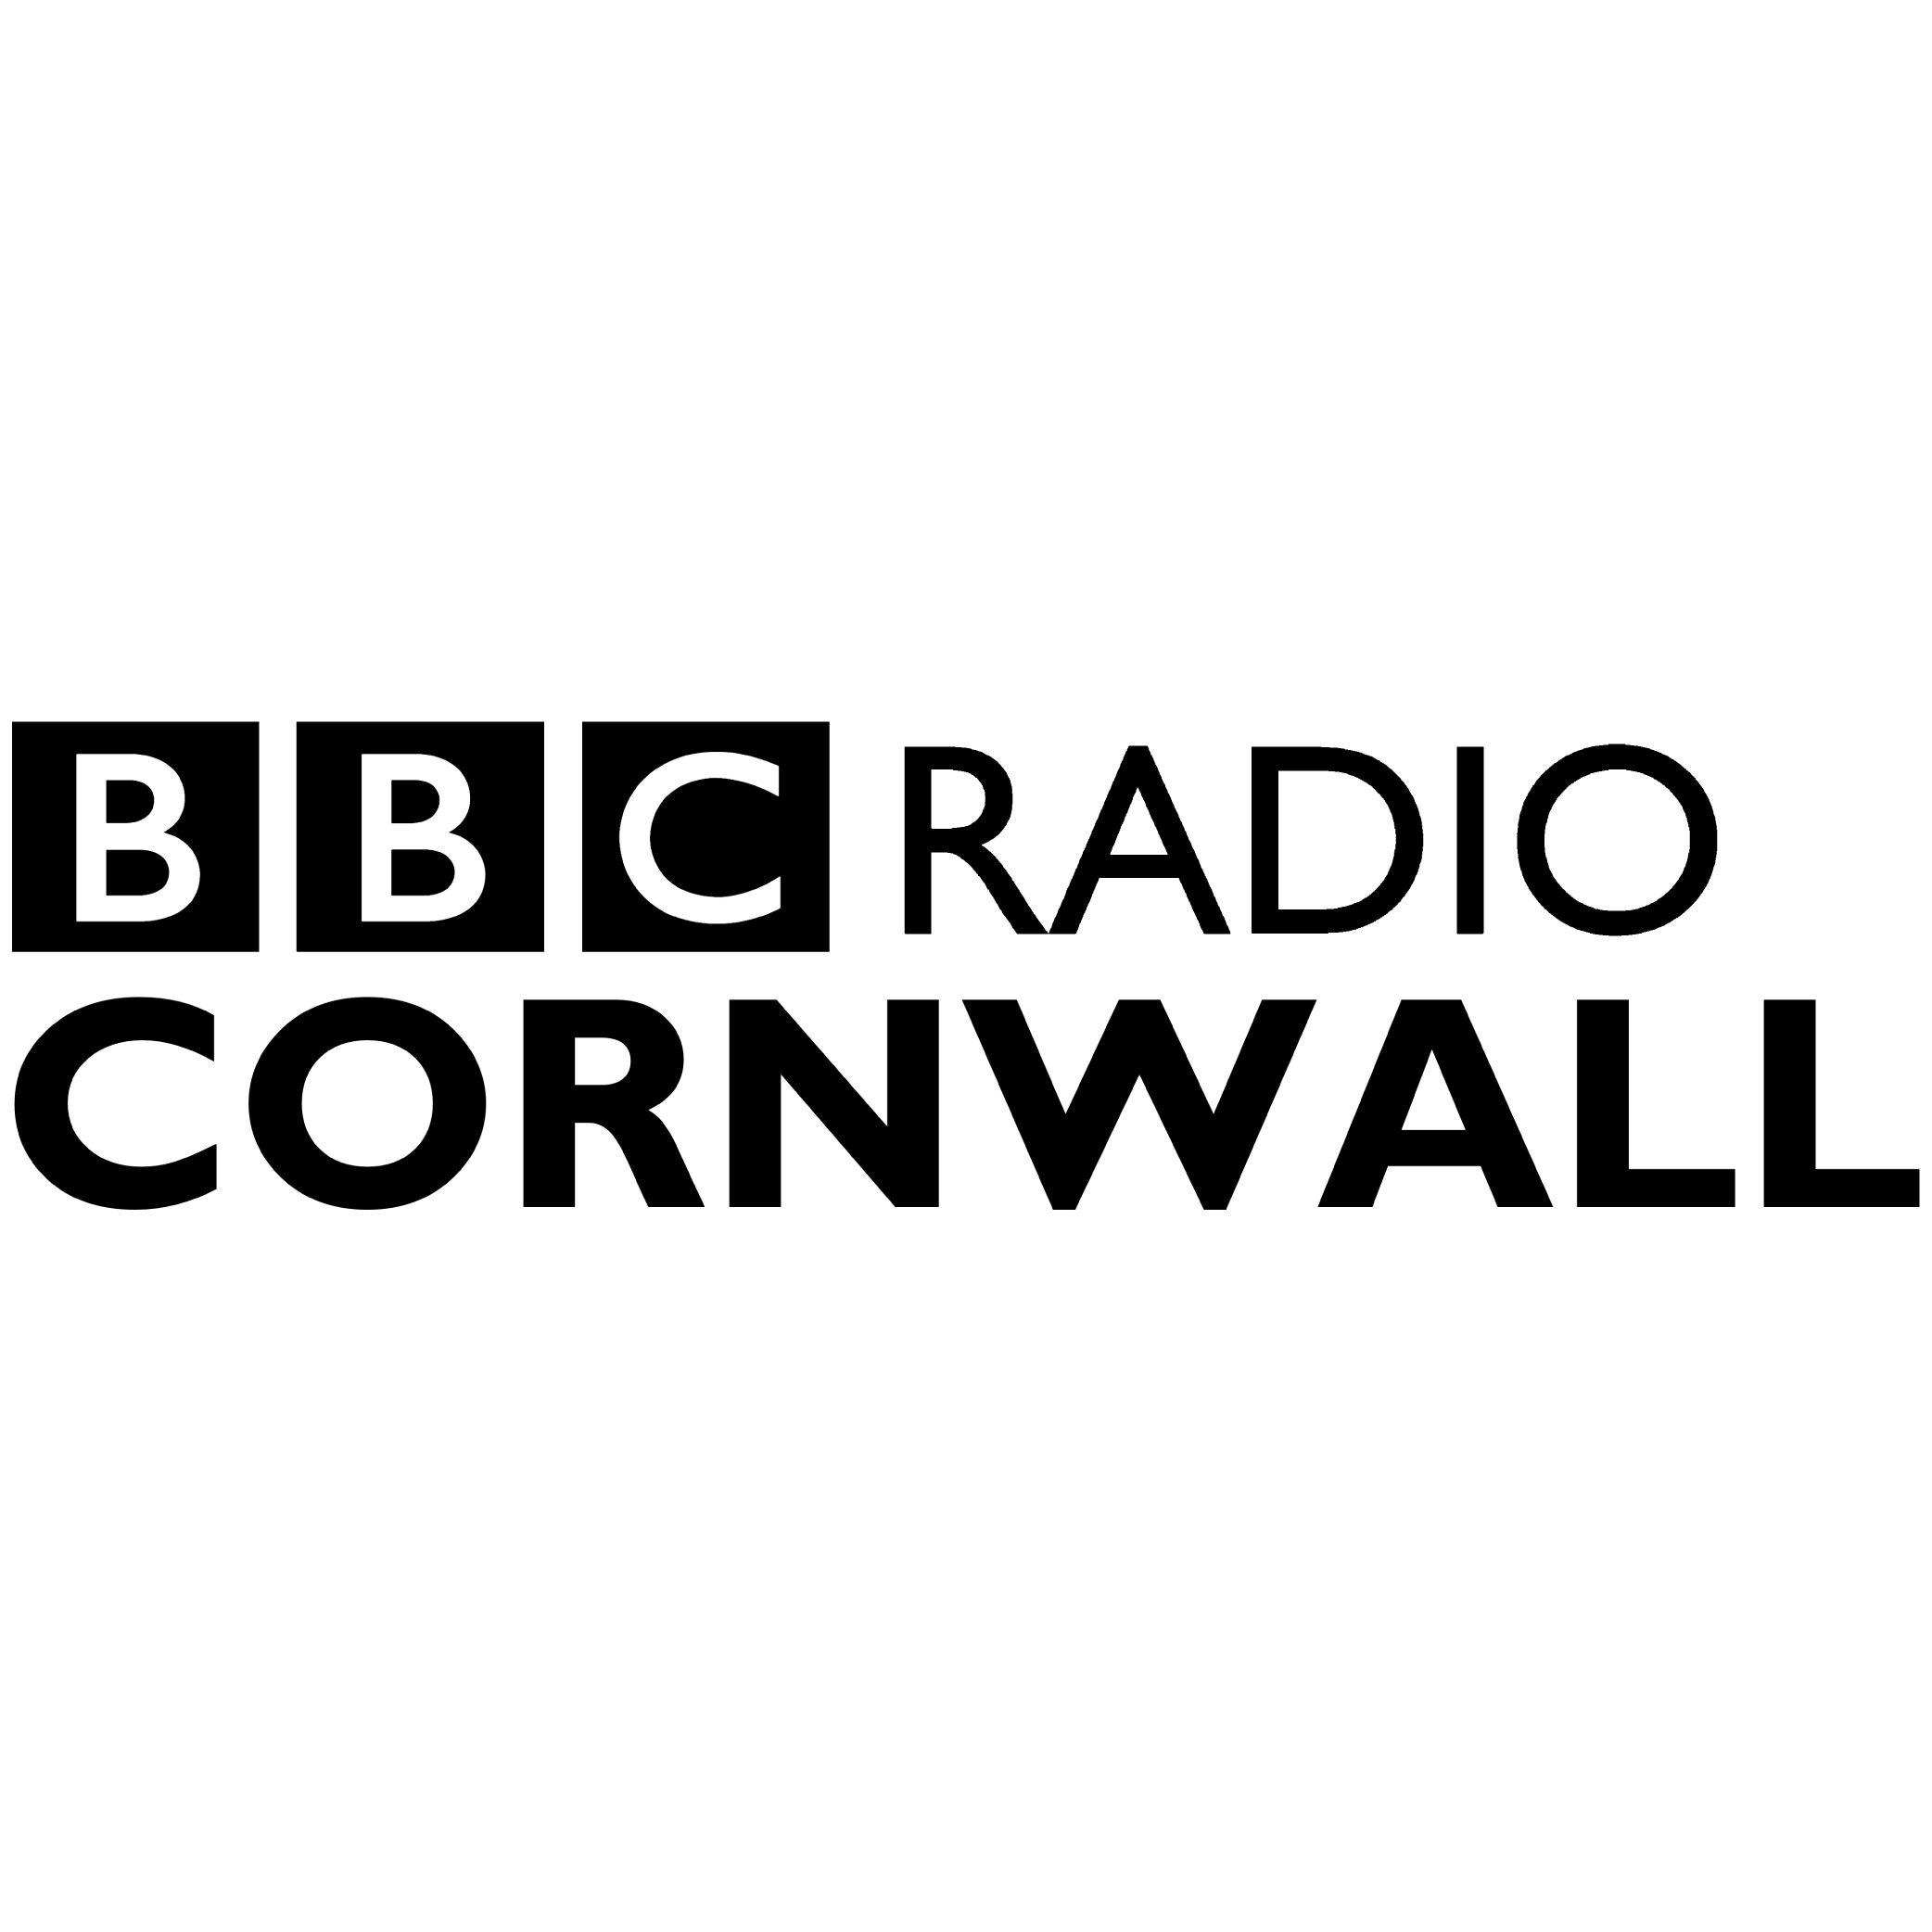 BBC Radio Cornwall logo